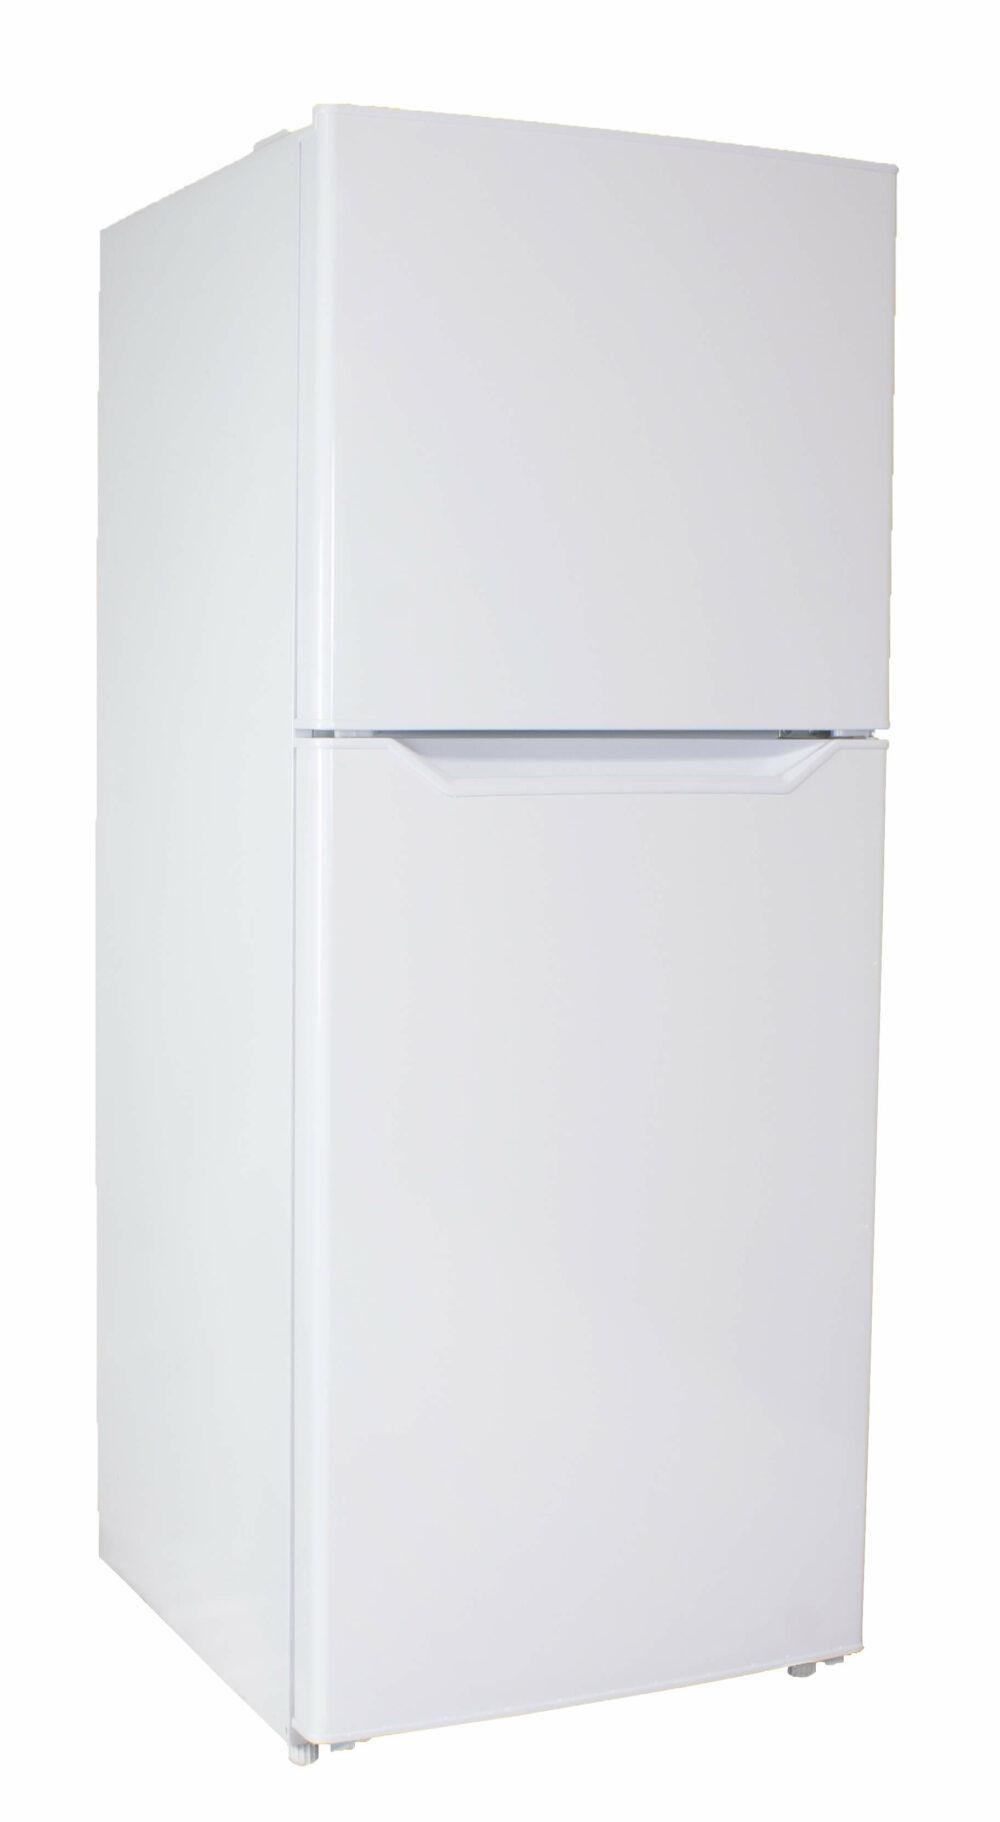 23410 - 10 cubic foot fridge